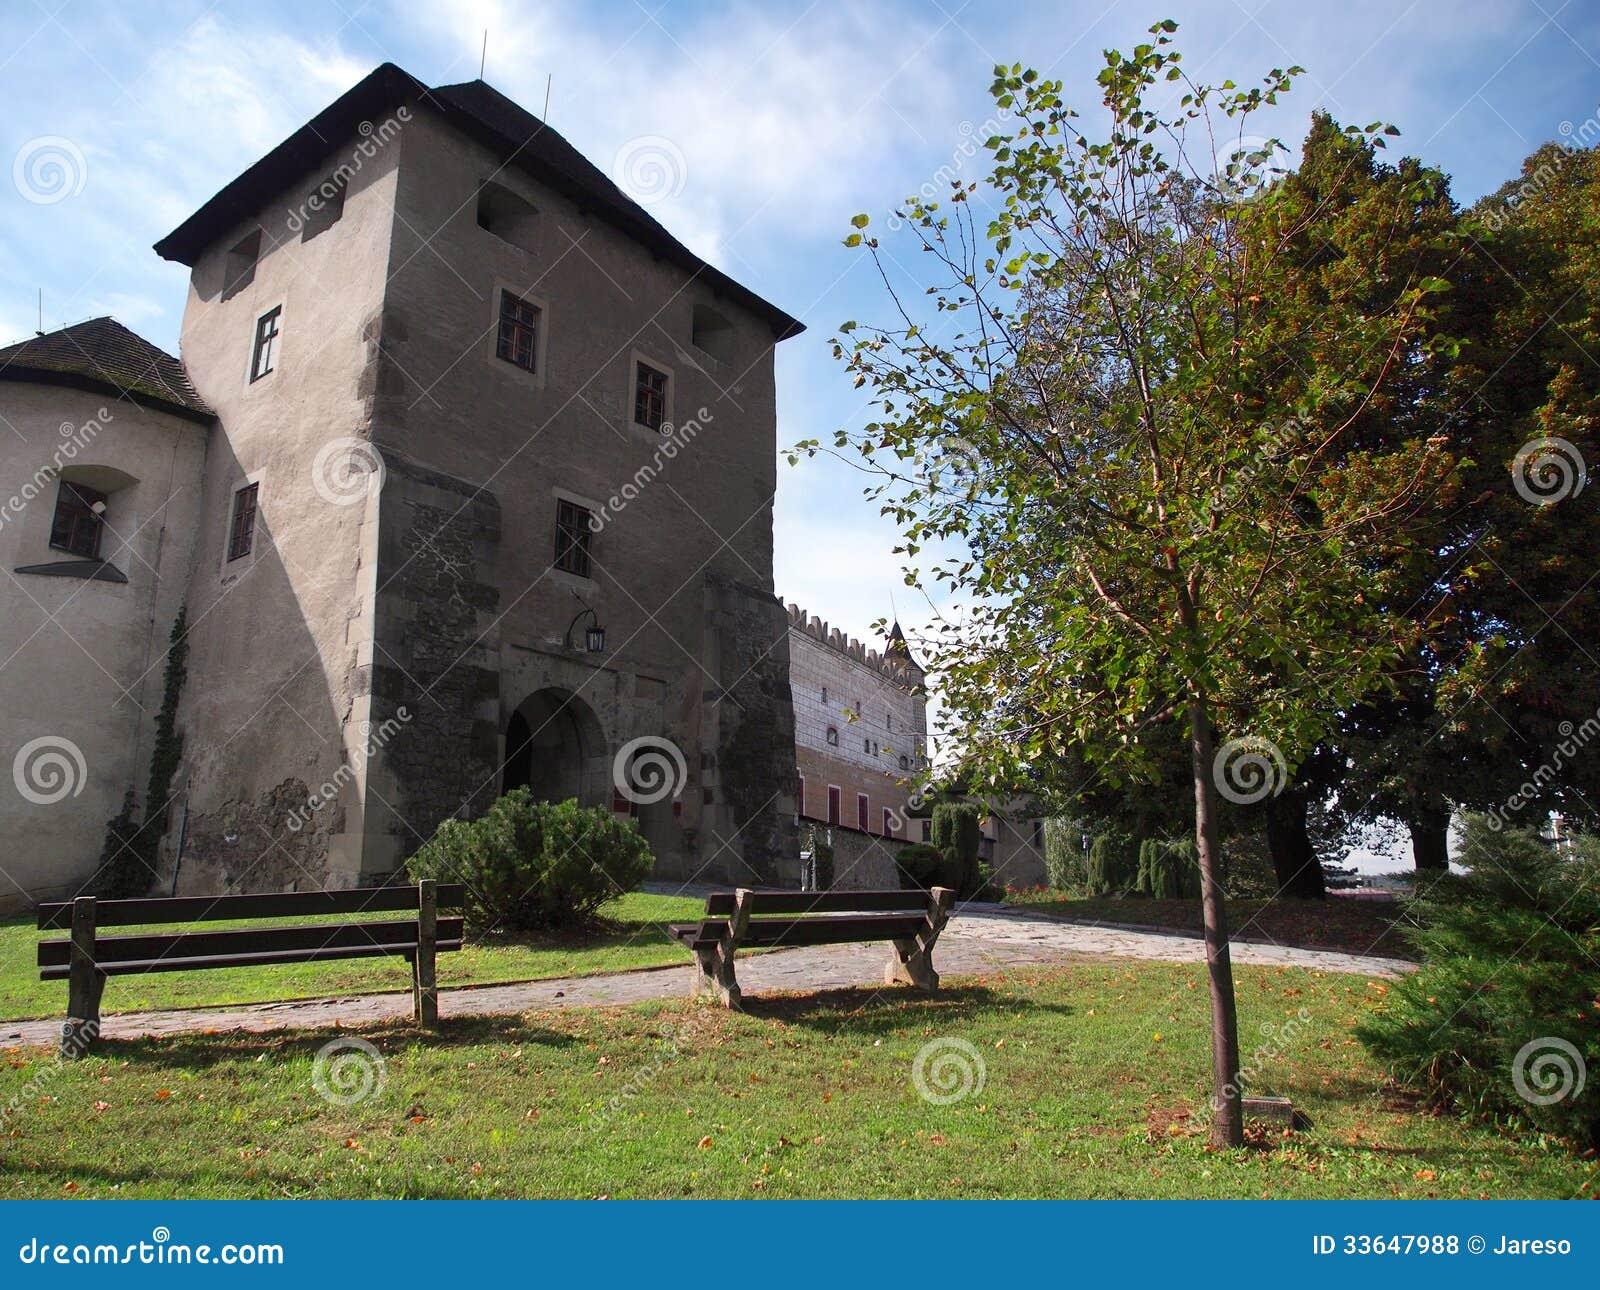 Entrance to Zvolen Castle, Slovakia